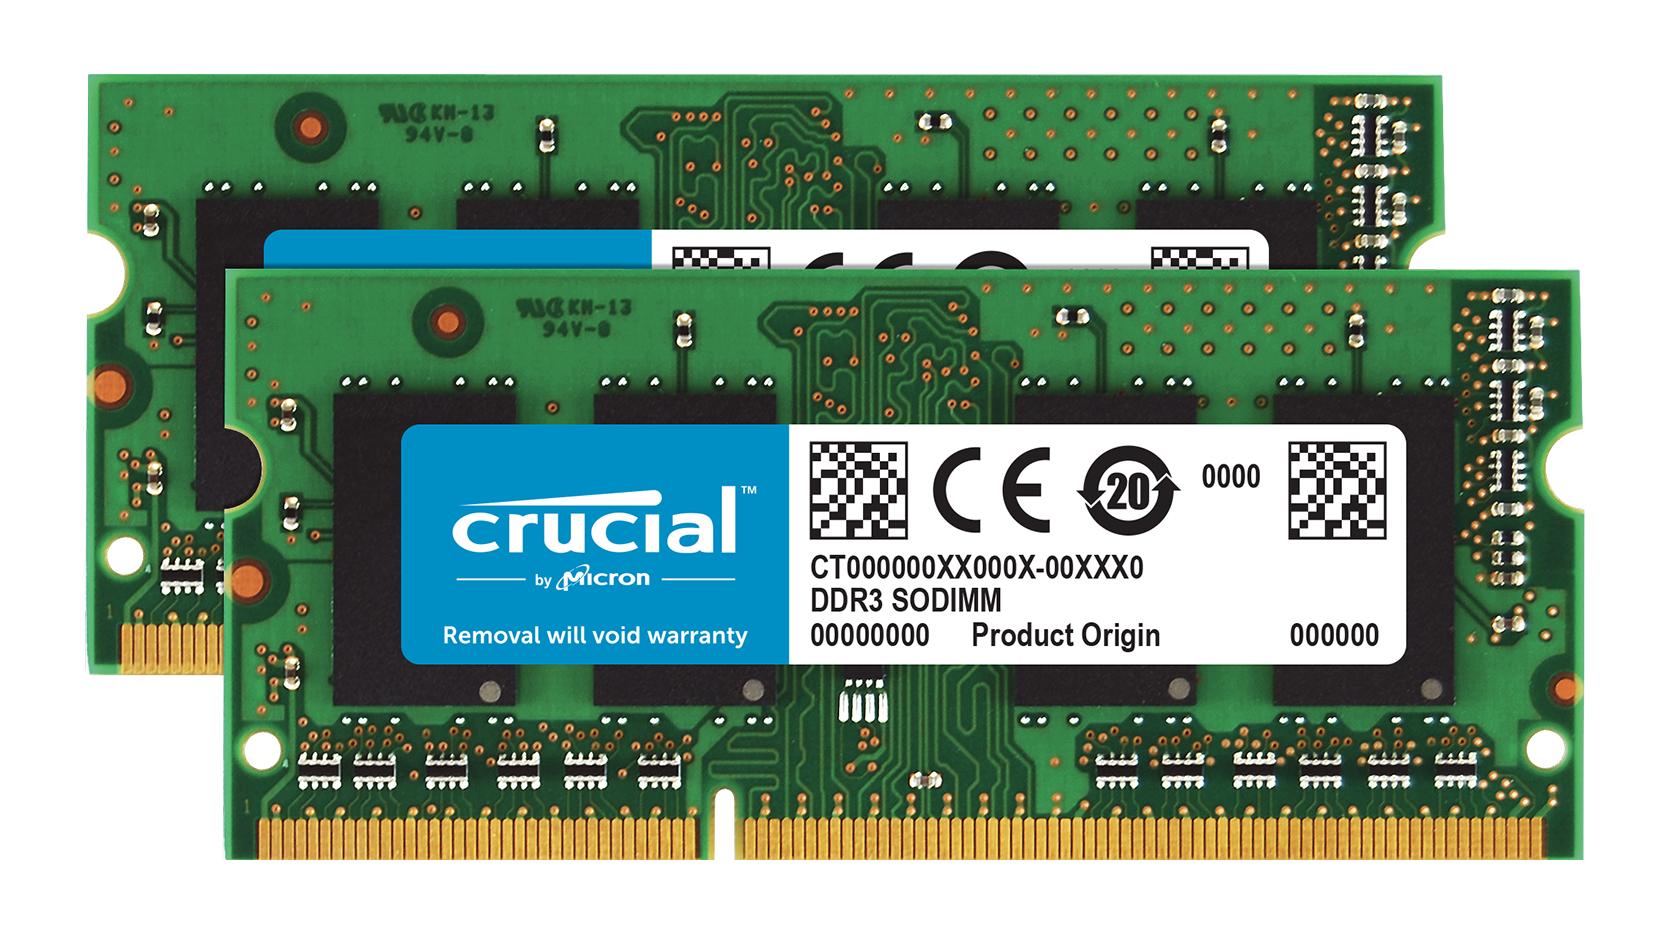 Crucial 8GB PC3-12800 Kit memory module 2 x 4 GB 21 1600 MHz